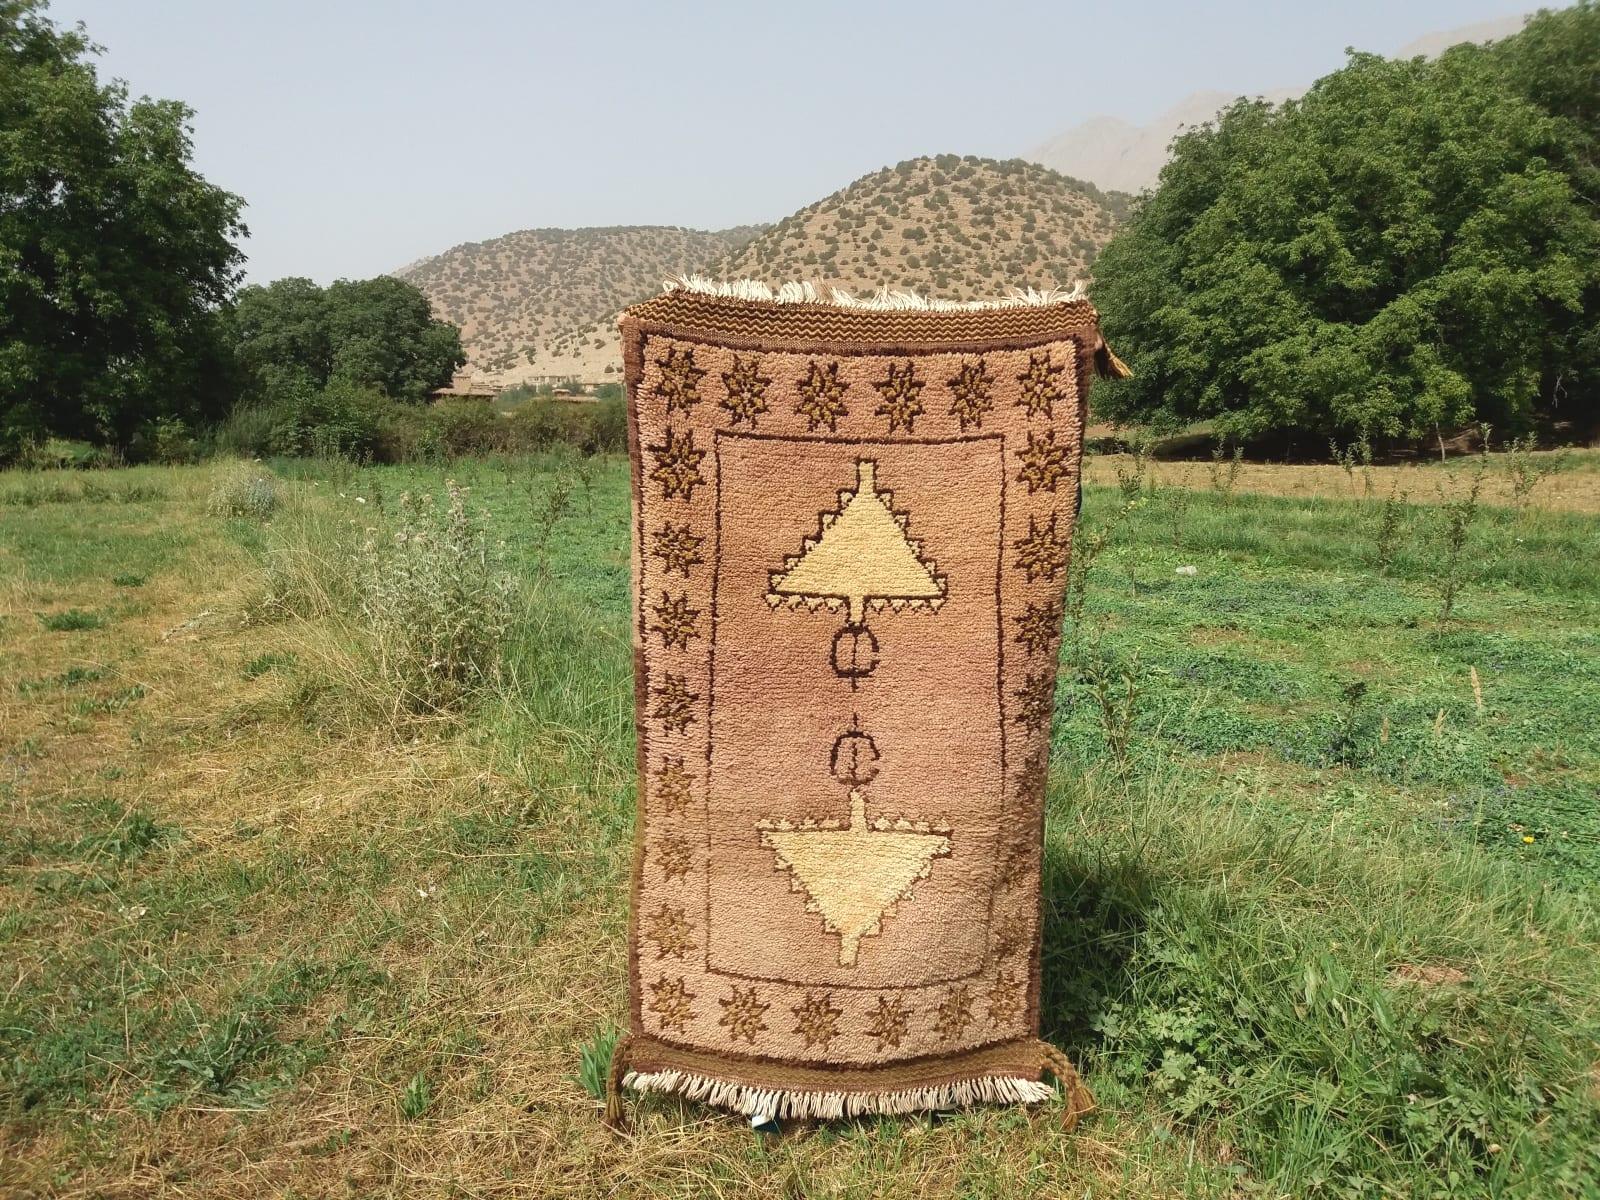 Beni Ourain Rug  Orange, Black Morocco